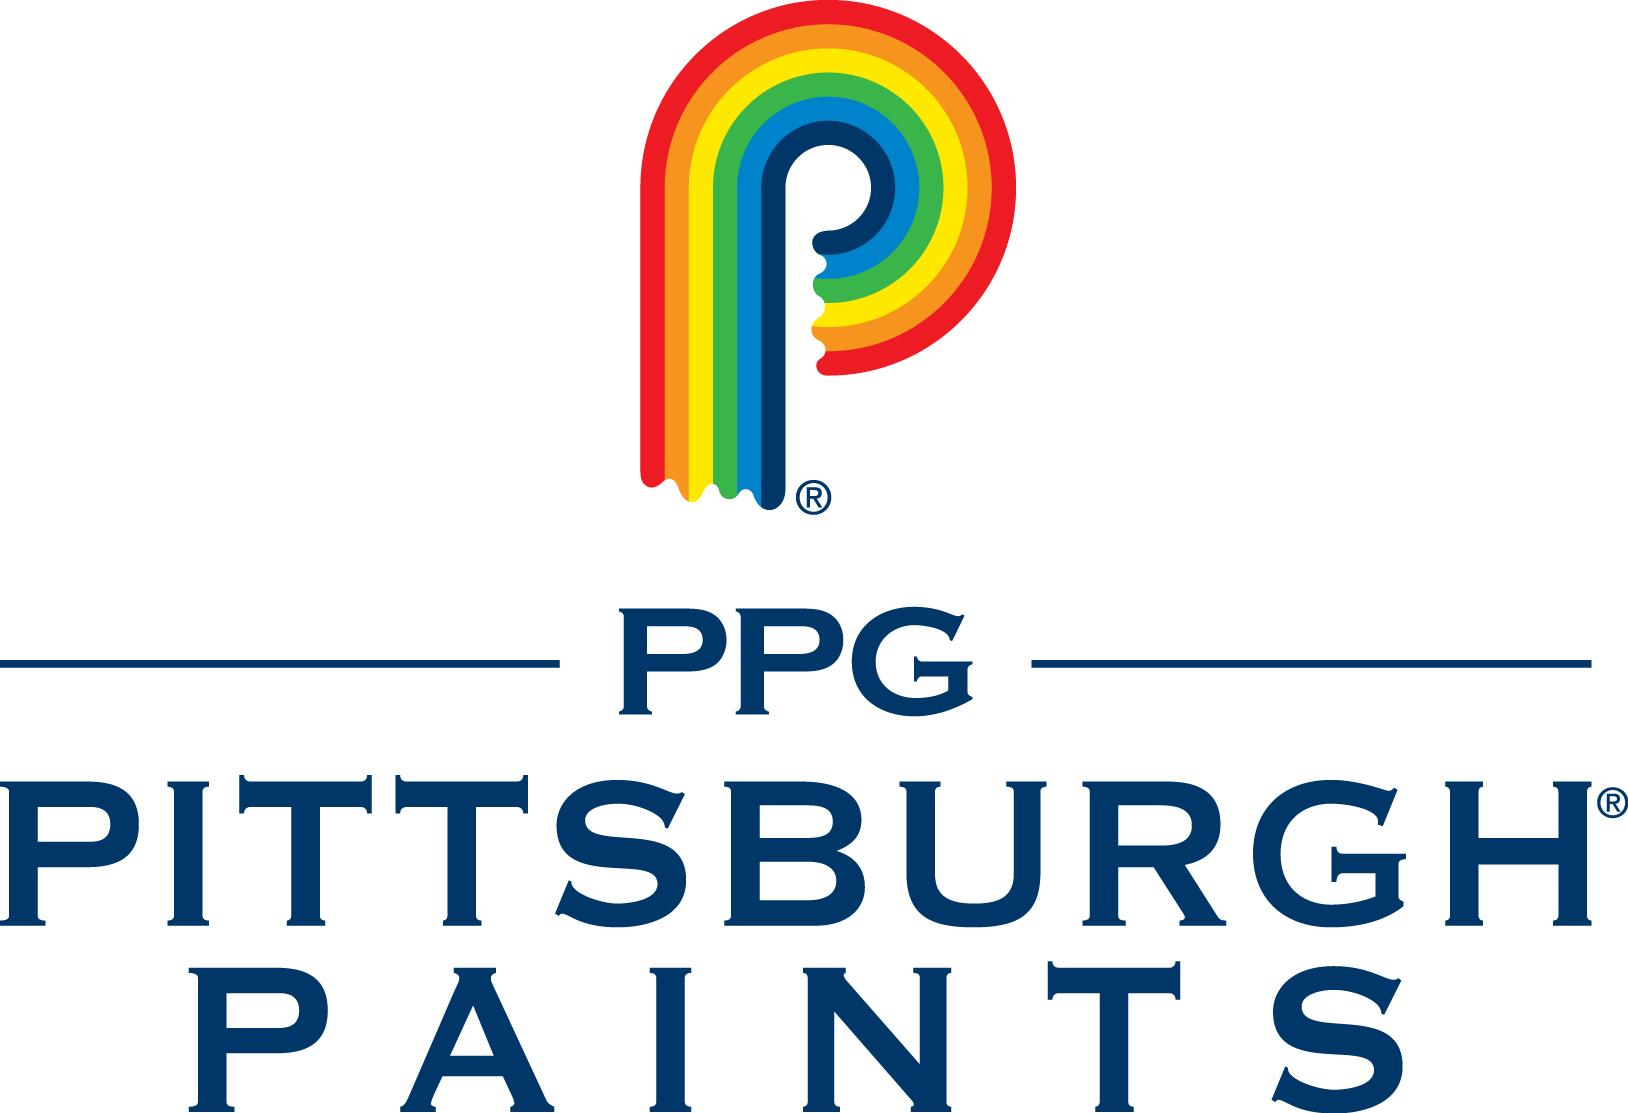 pittsburgh paints logo